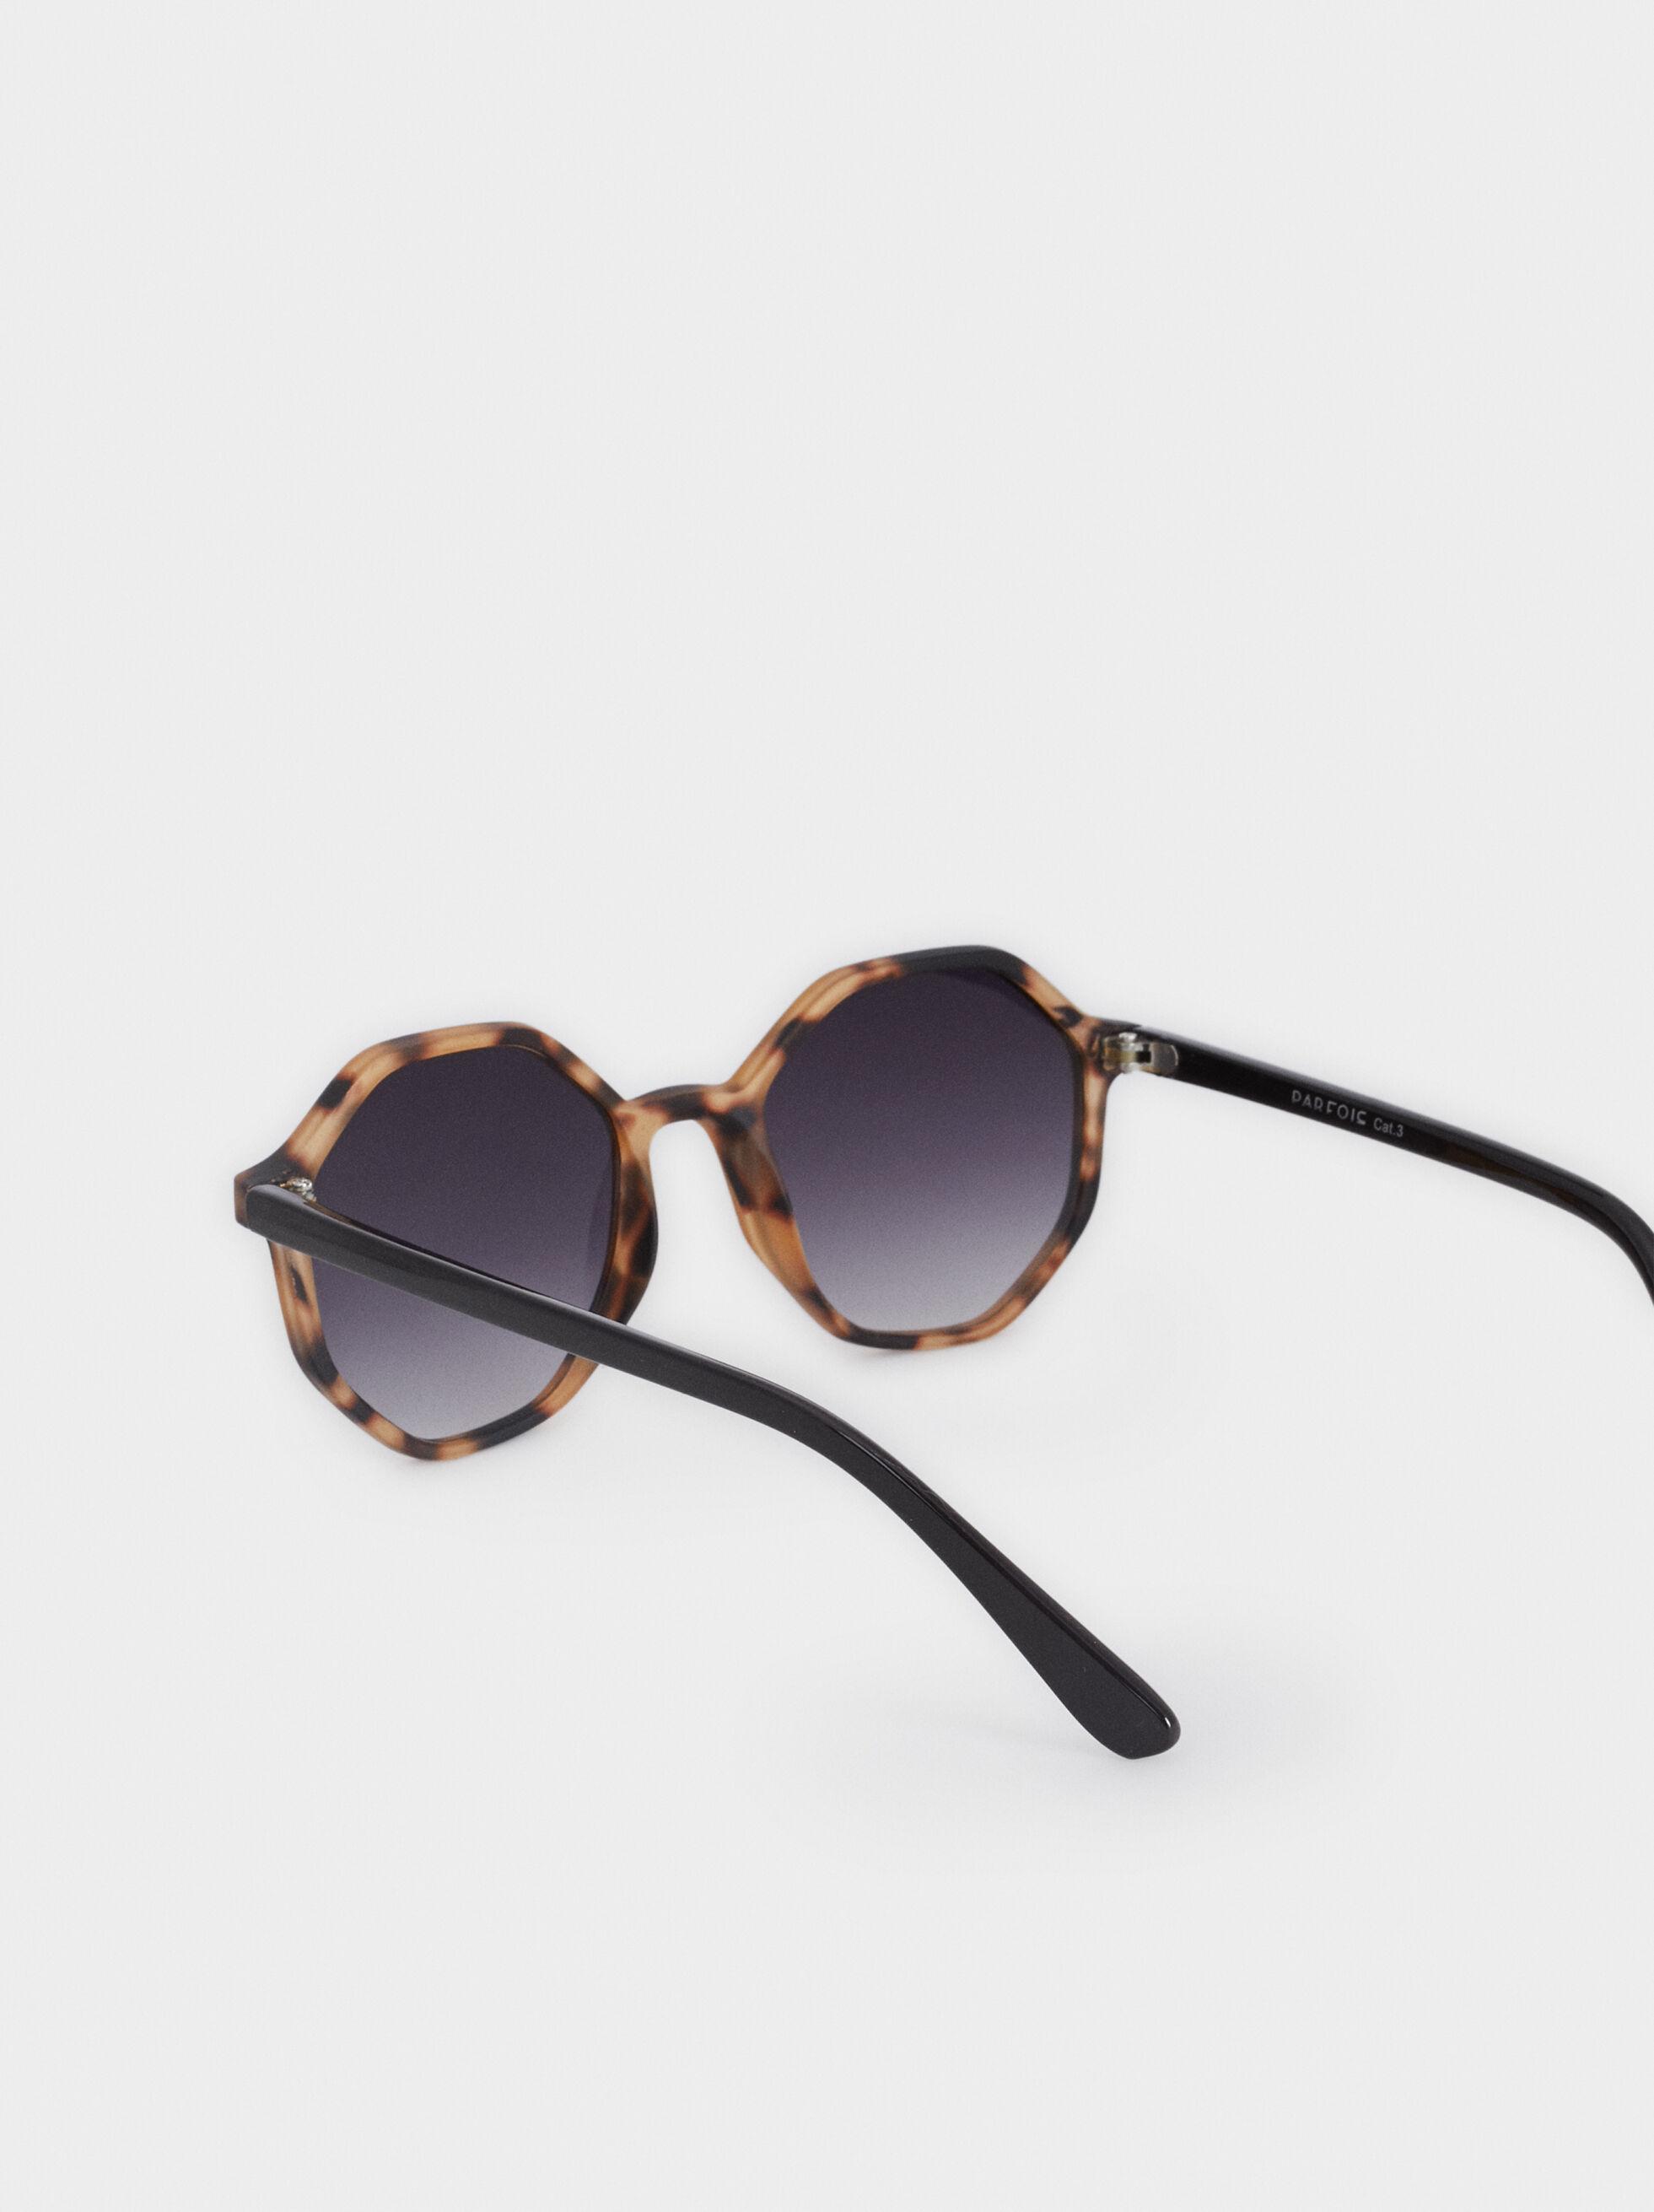 Tortoiseshell Sunglasses, Brown, hi-res